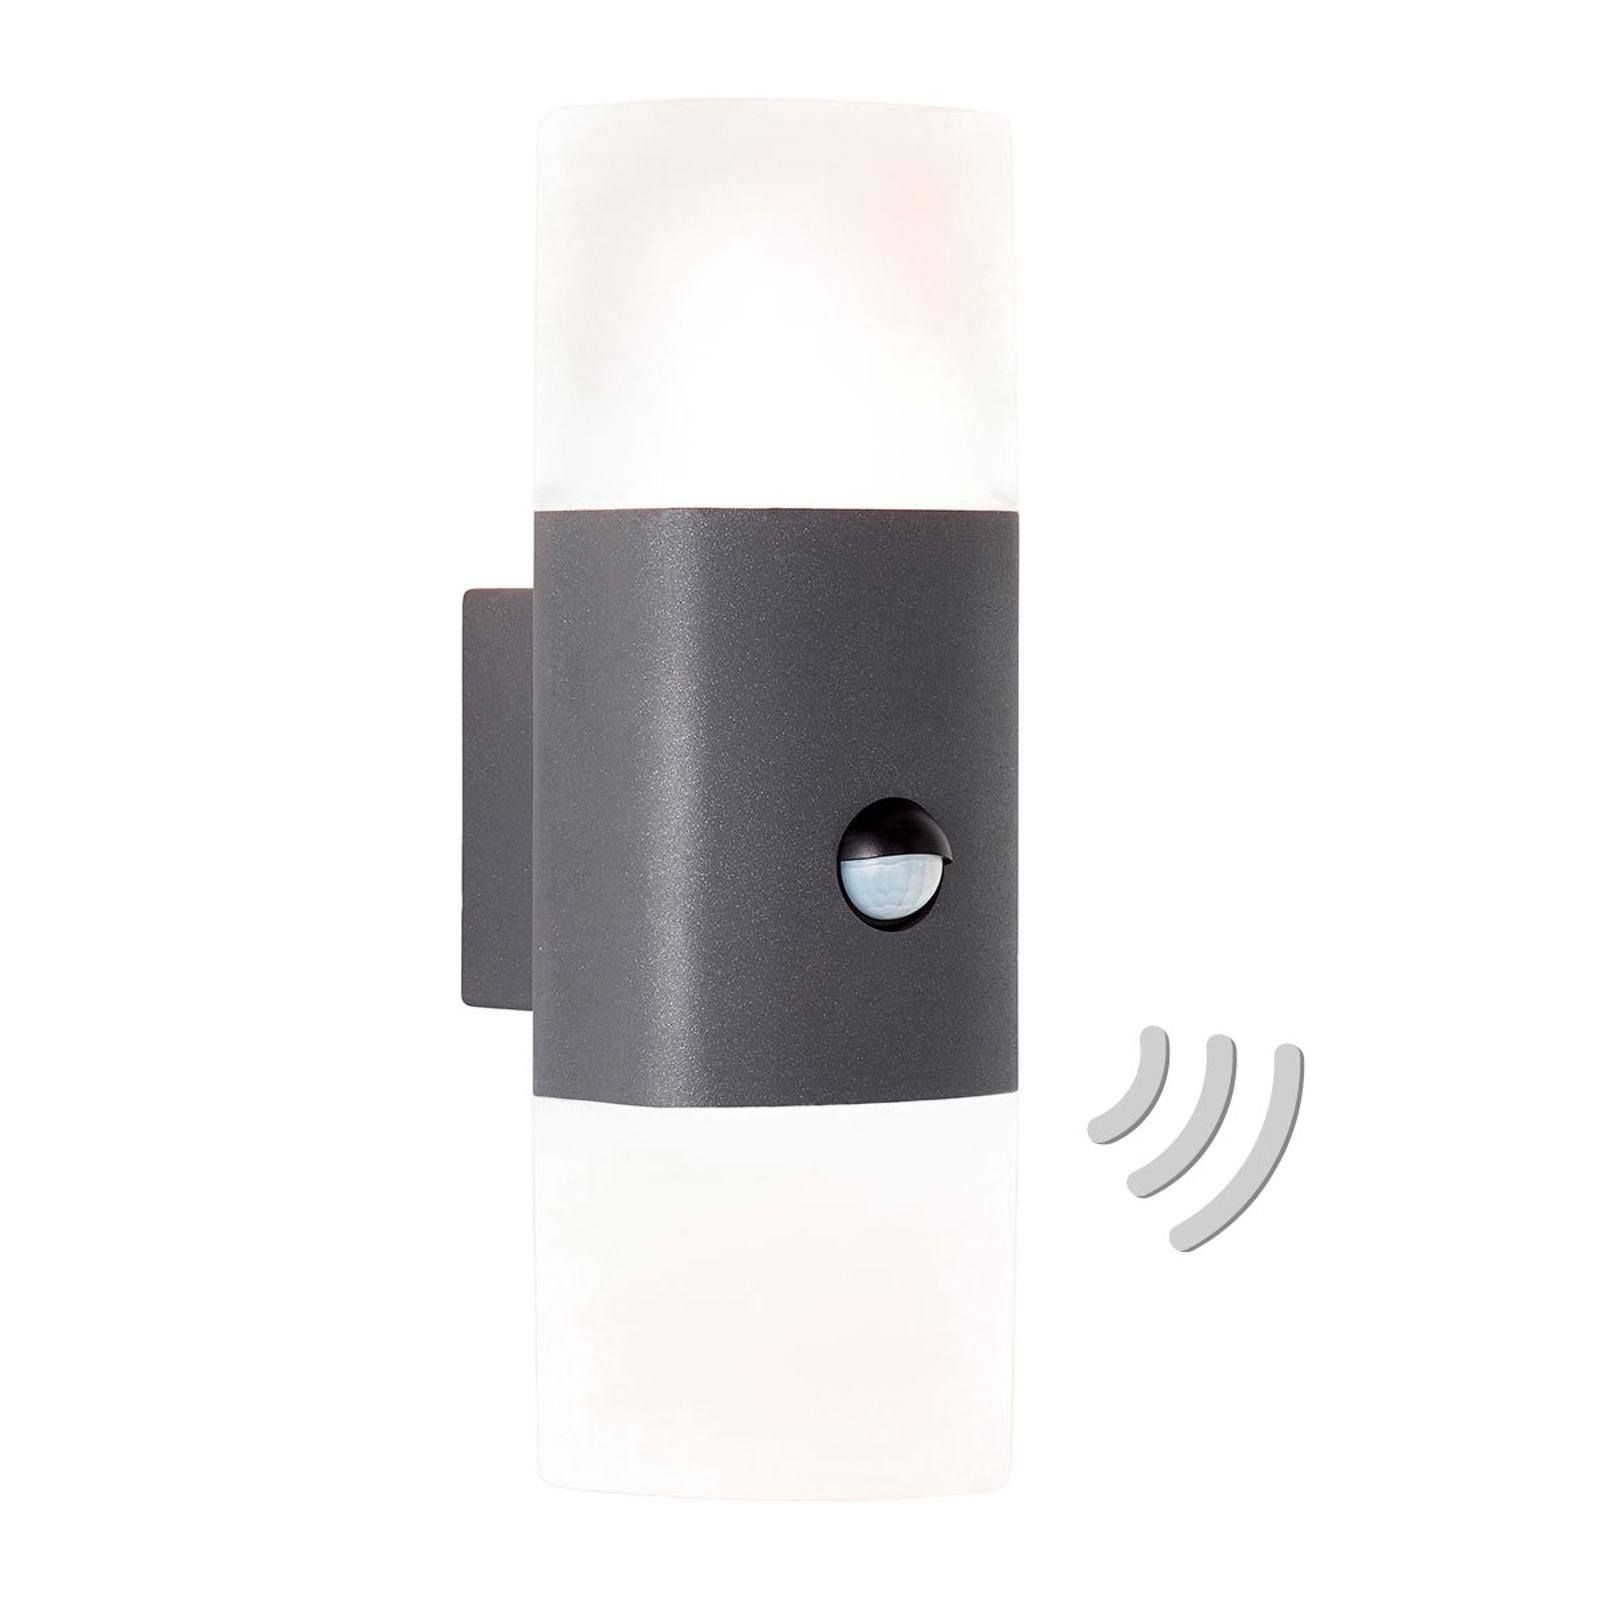 AEG Farlay LED-Außenwandlampe, zweiflammig Sensor